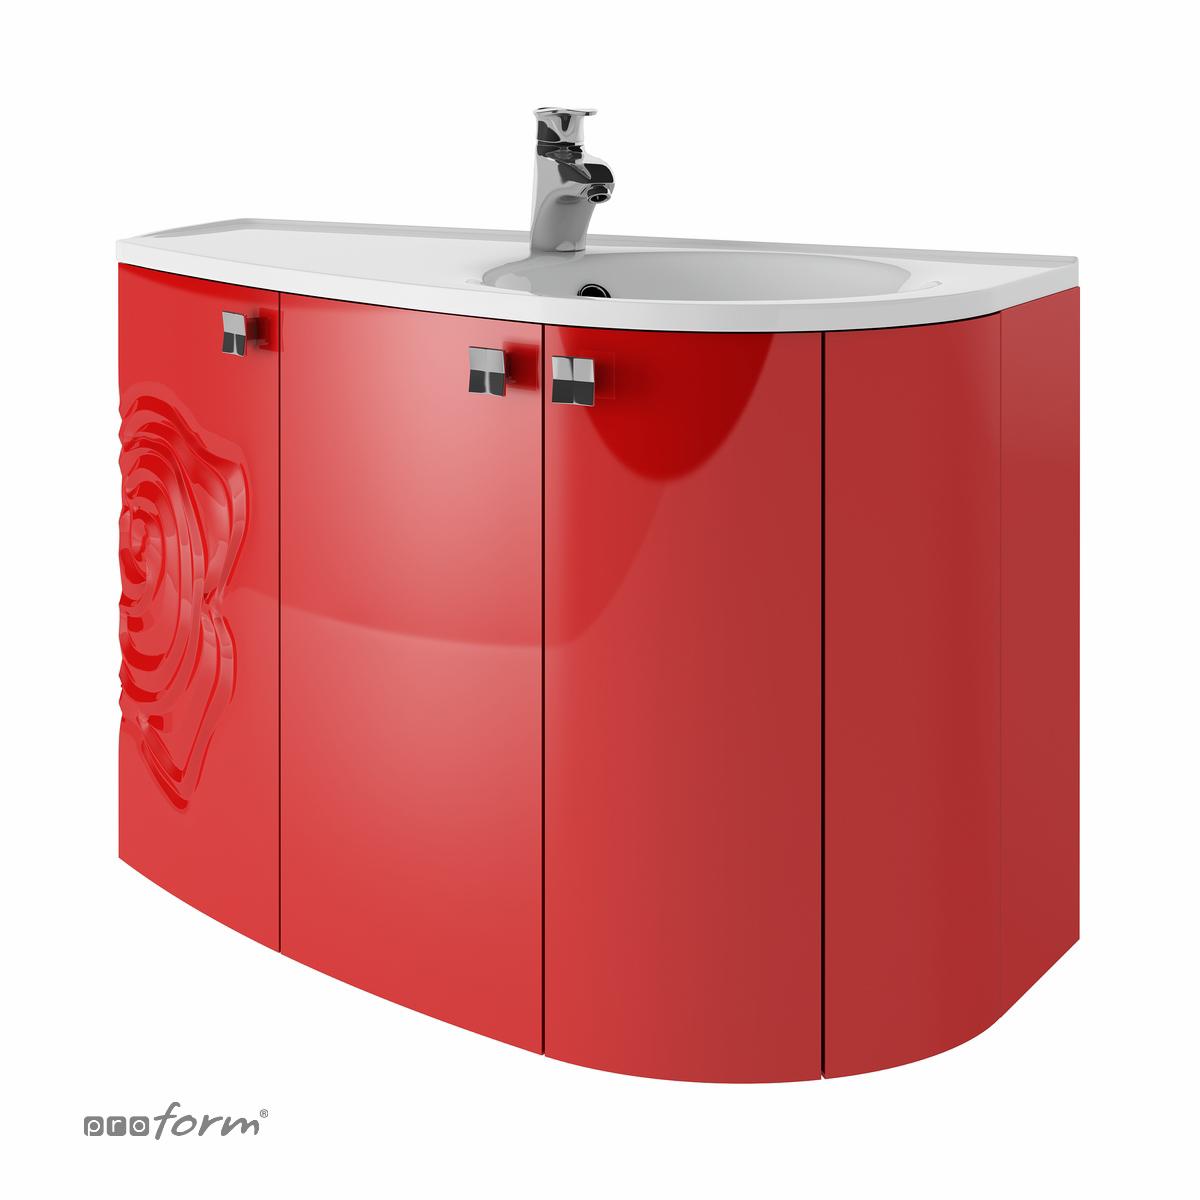 Szafka Rose pod umywalkę gięta czerwona Proform